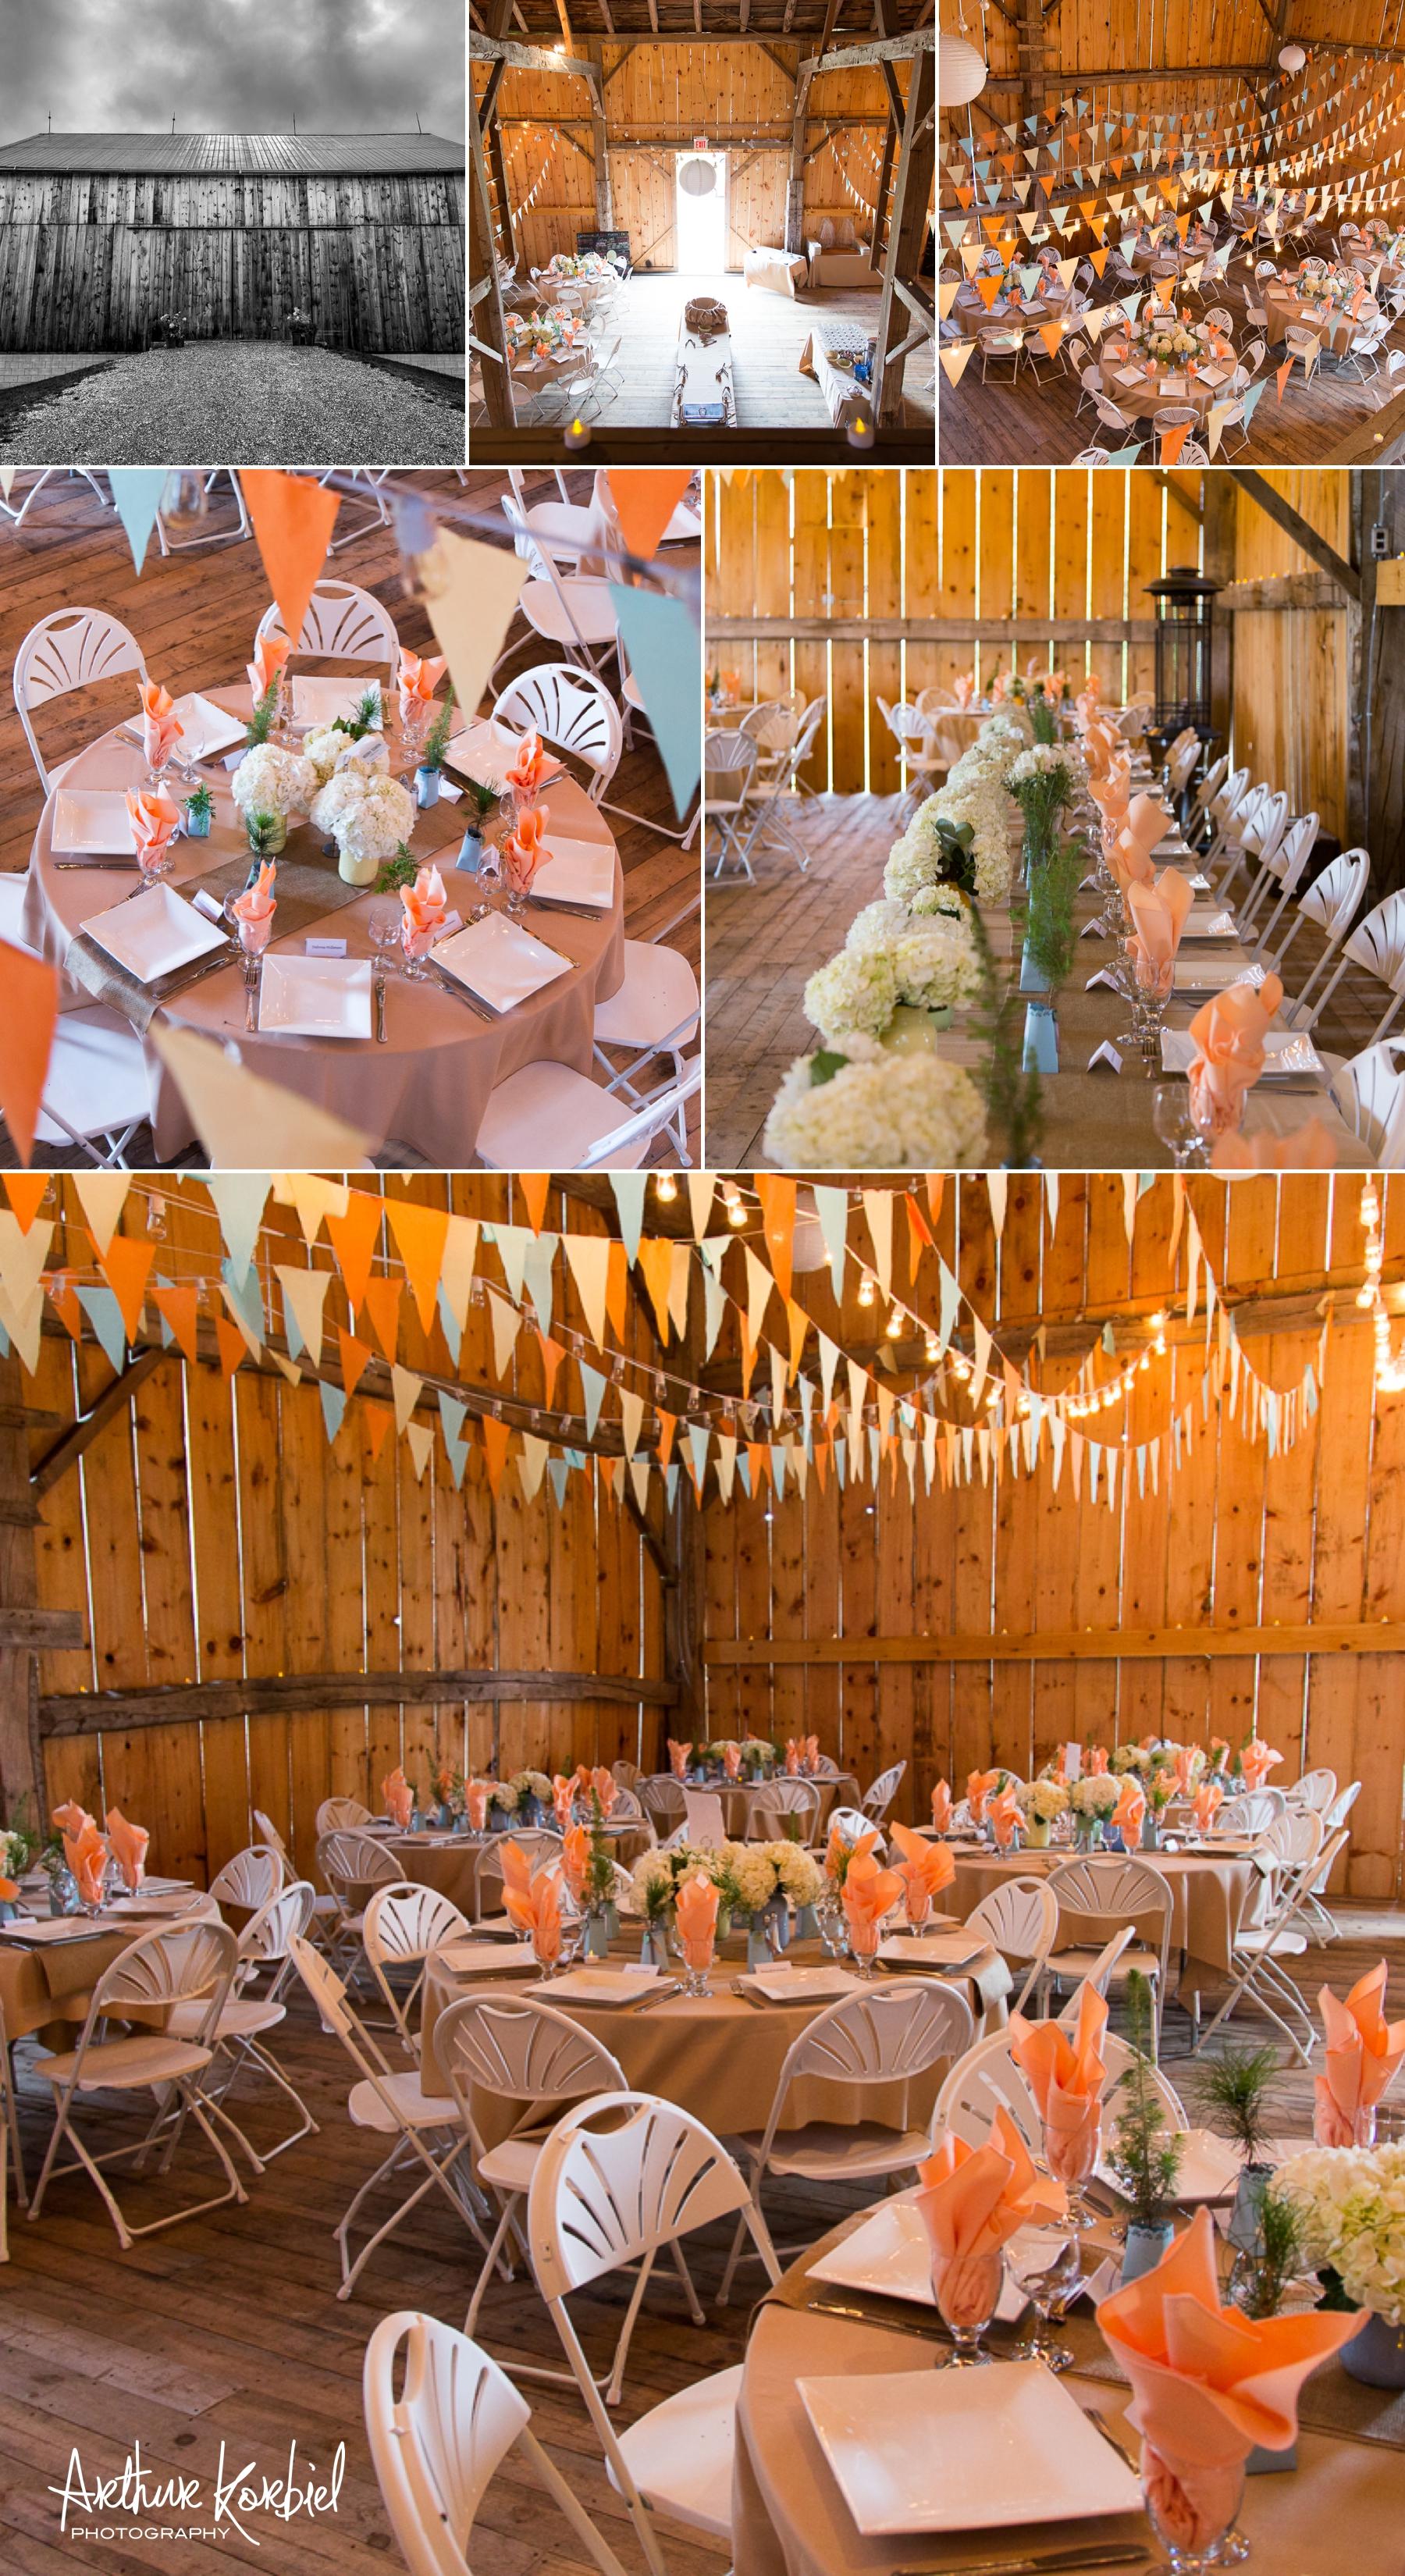 Arthur Korbiel Photography - London Engagement Photographer - Sauble Beach Barn Wedding - Samantha & Dan_003.jpg